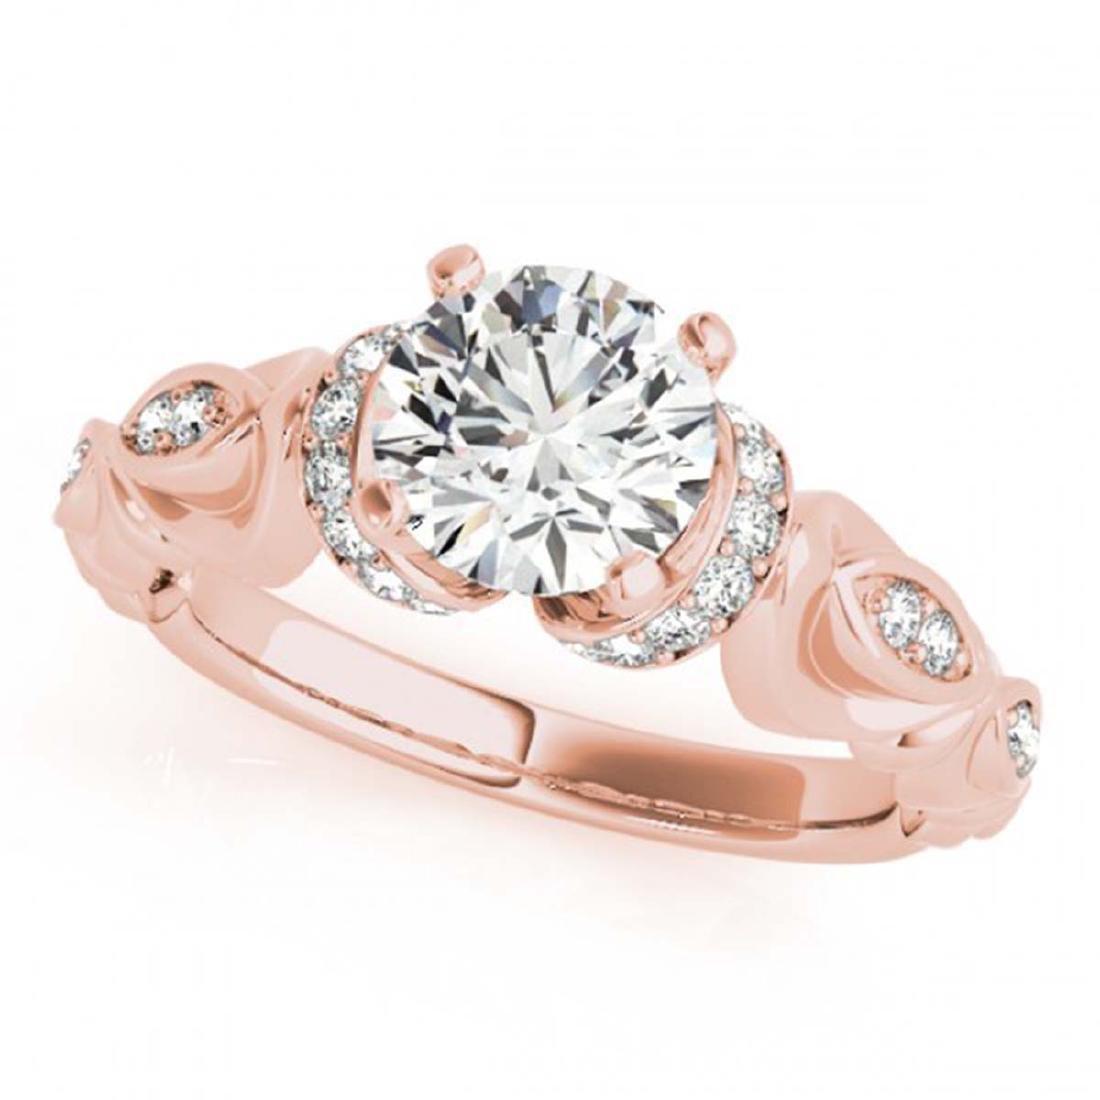 0.95 ctw VS/SI Diamond Ring 18K Rose Gold - REF-150A5V